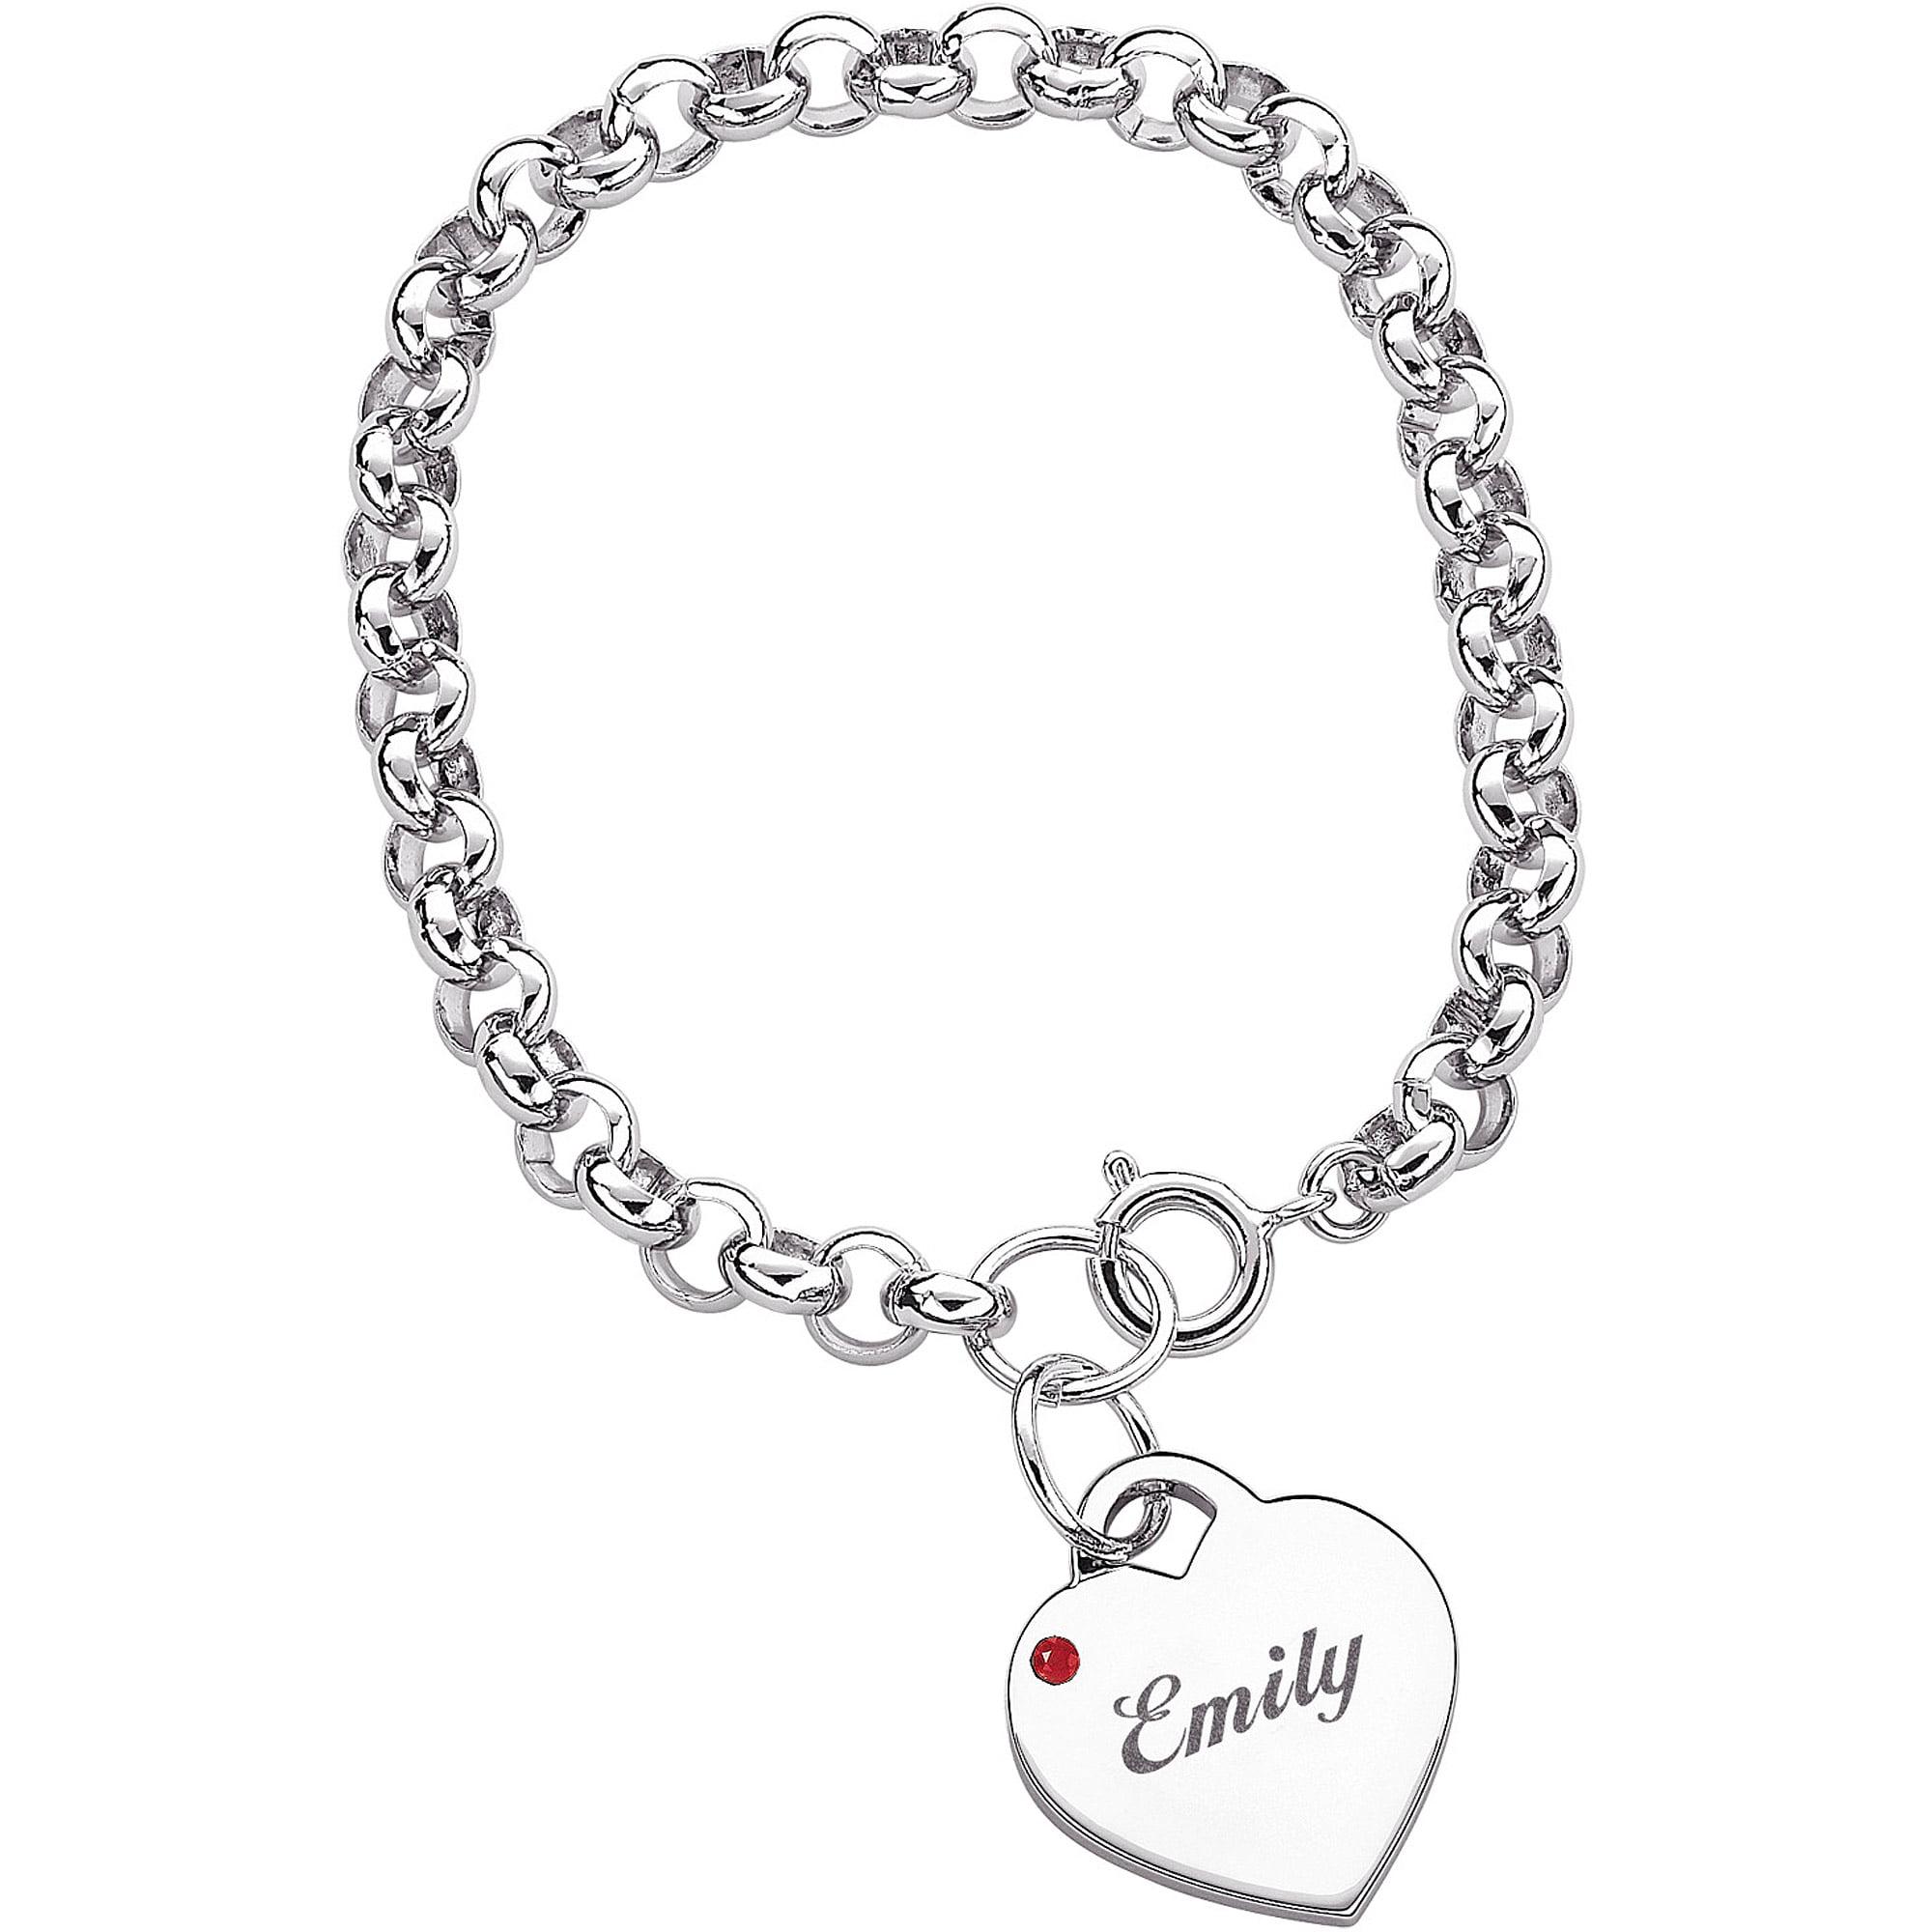 Personalized Name & Birthstone Heart Charm Bracelet